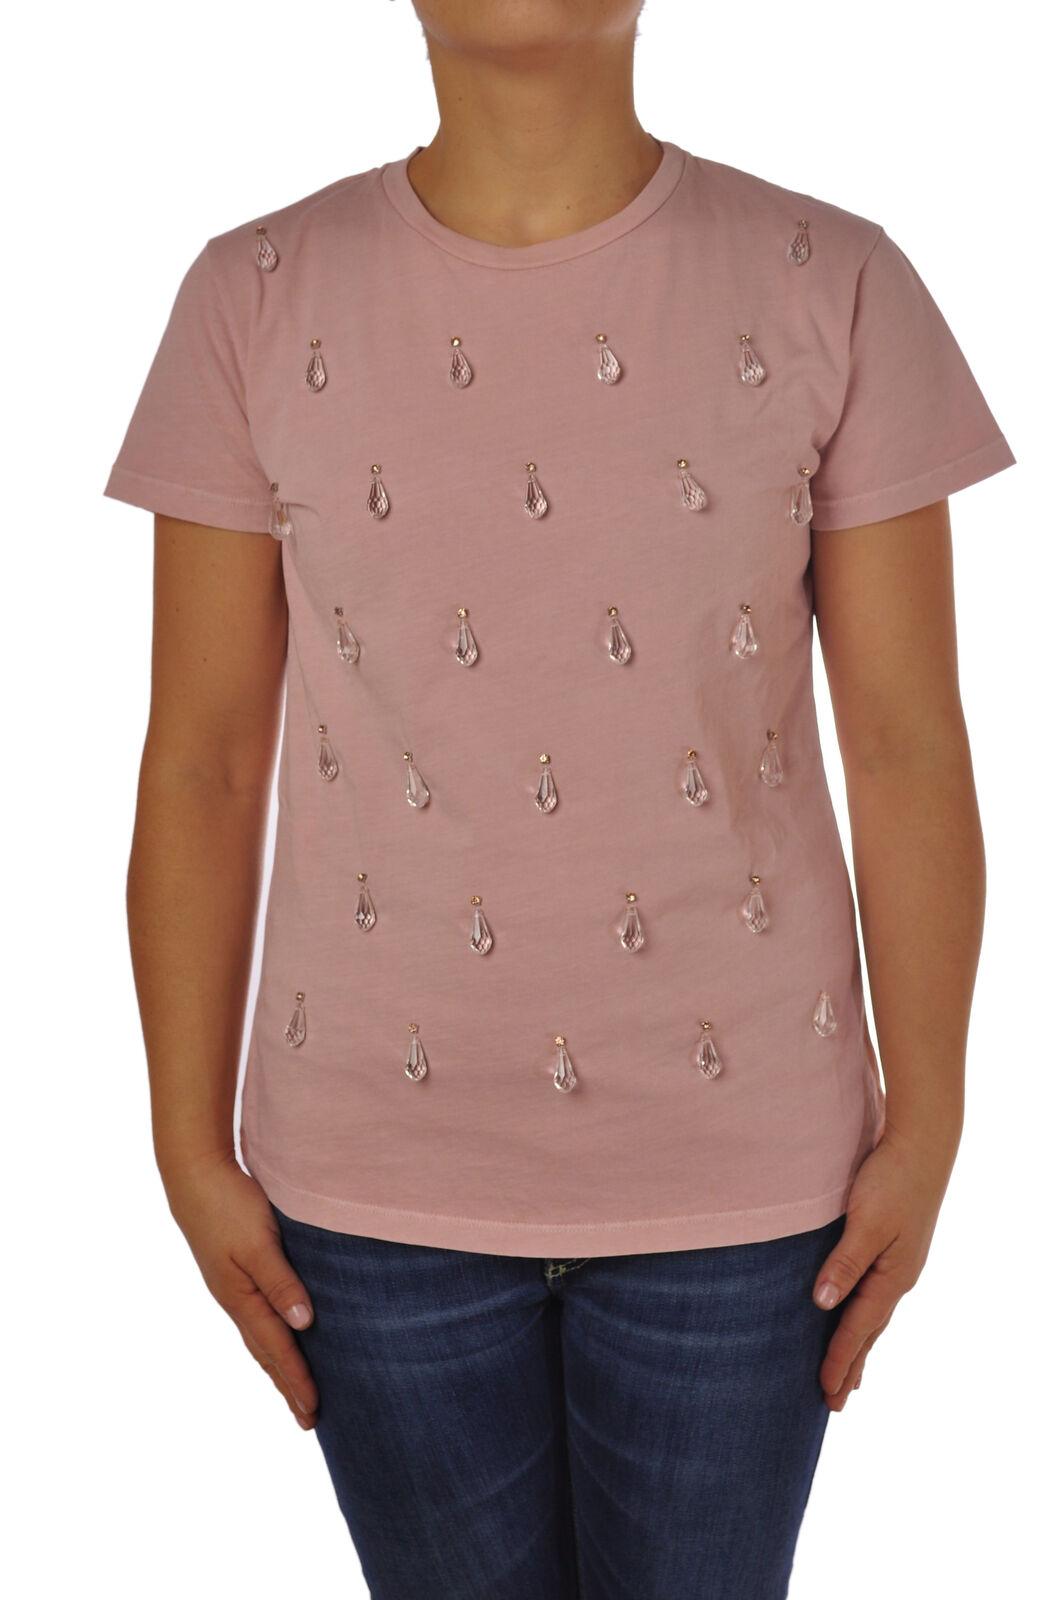 Pinko - Topwear-T-shirts - Woman - Pink - 4762010H184823